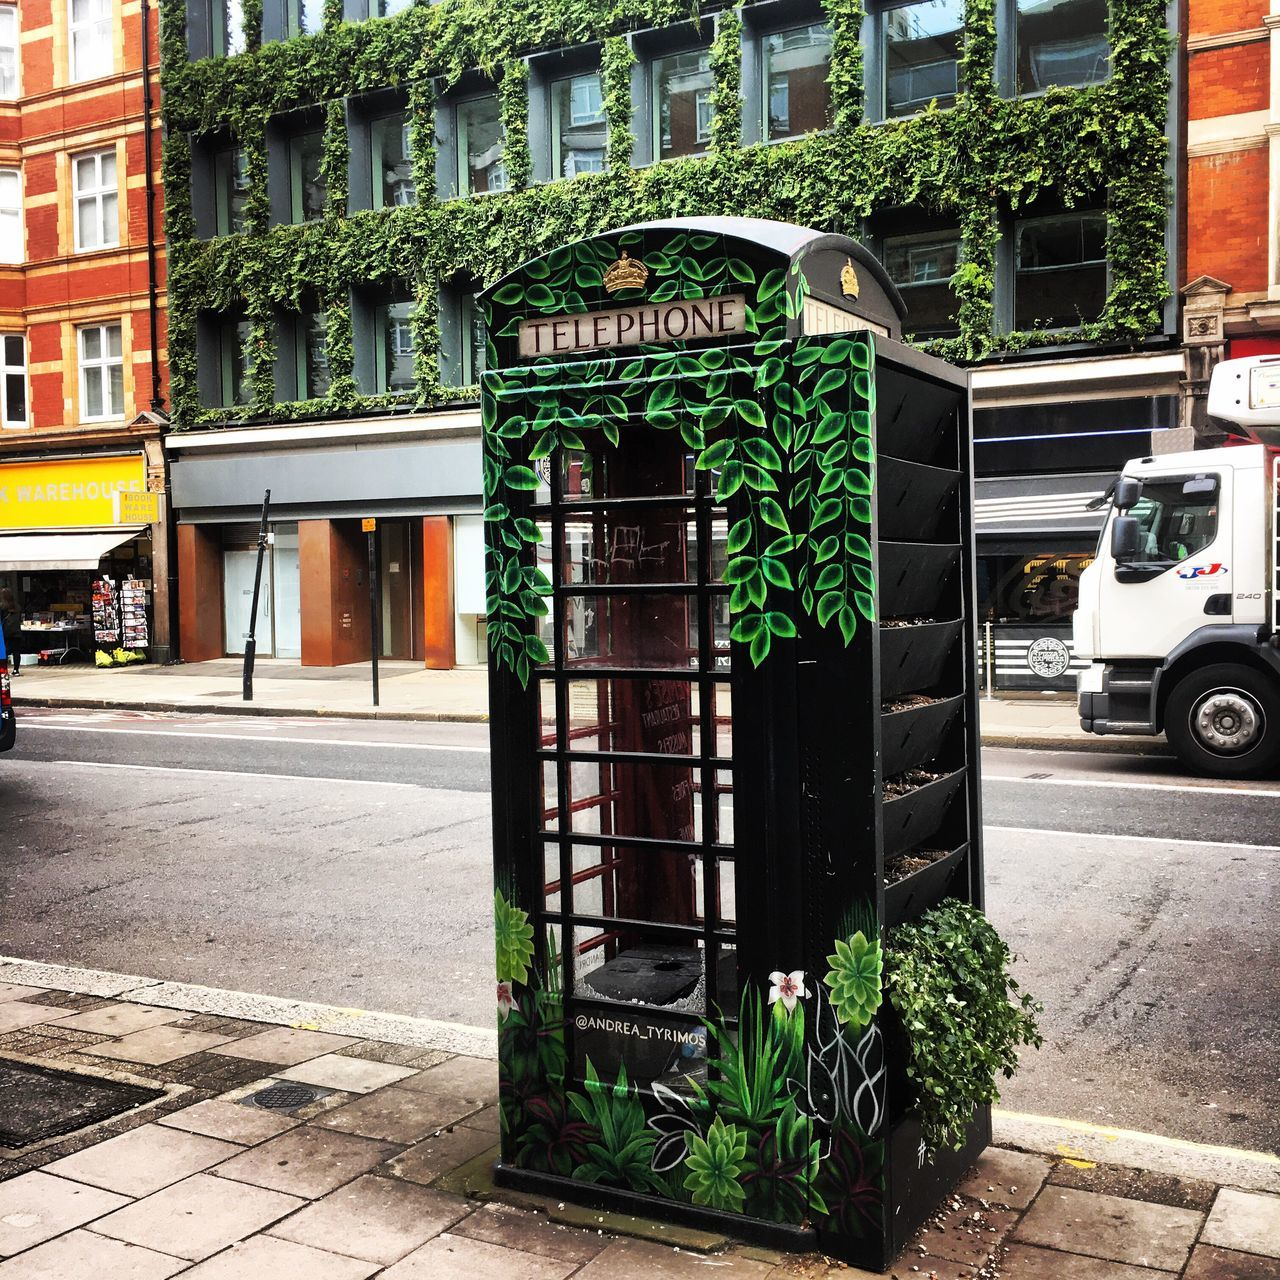 London Phone Red Phone Boxes Not Red Phone Box Phone Box Southampton Row Living Phone Box Plants Green